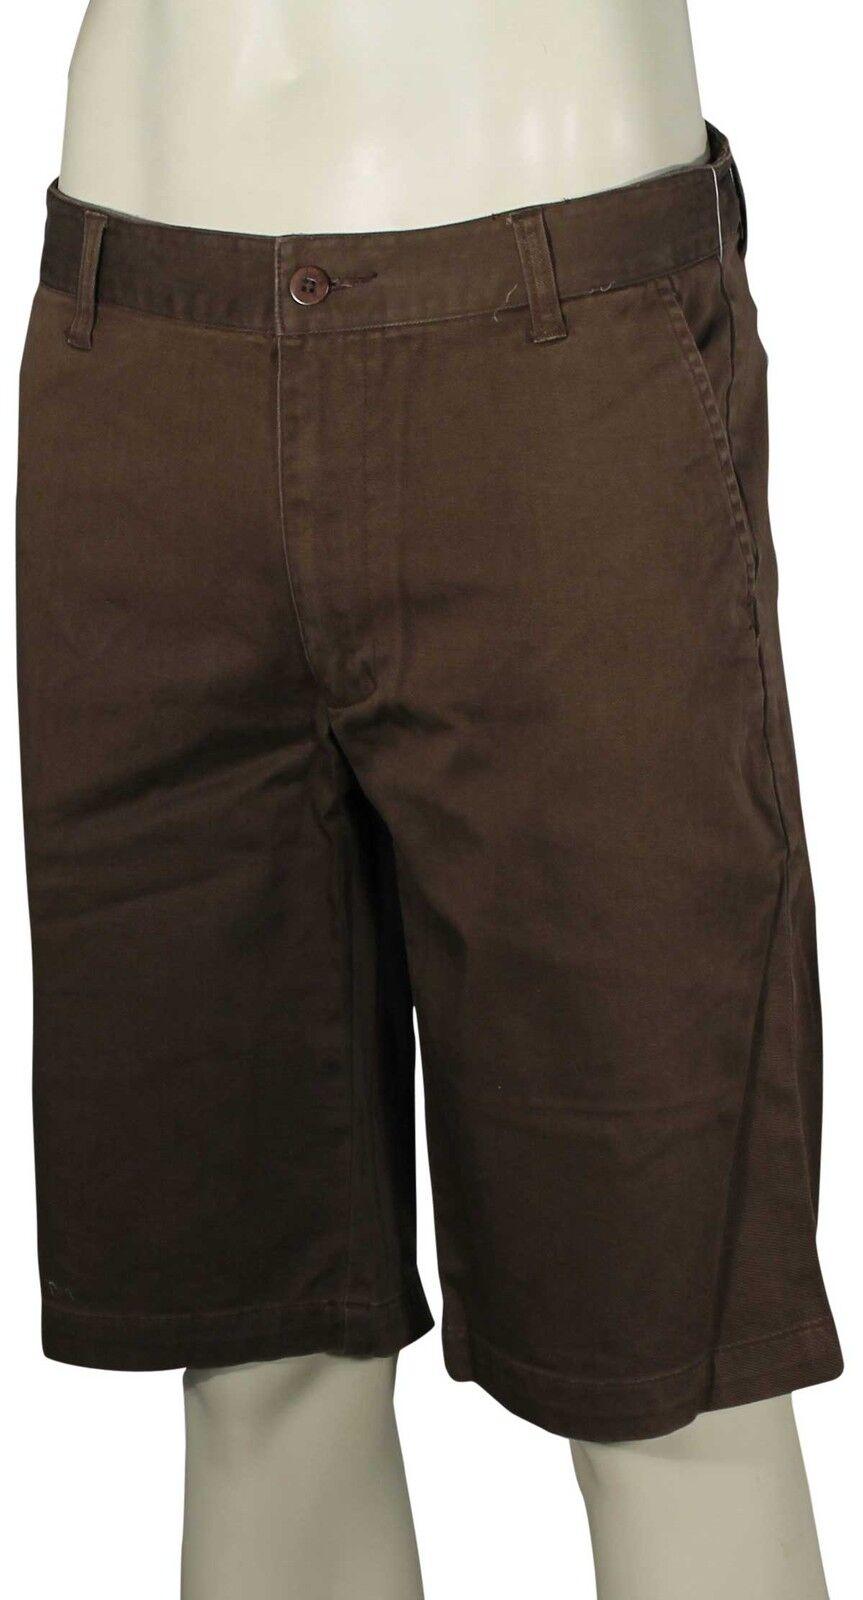 Etnies Spencer Walk Shorts - Chocolate - New